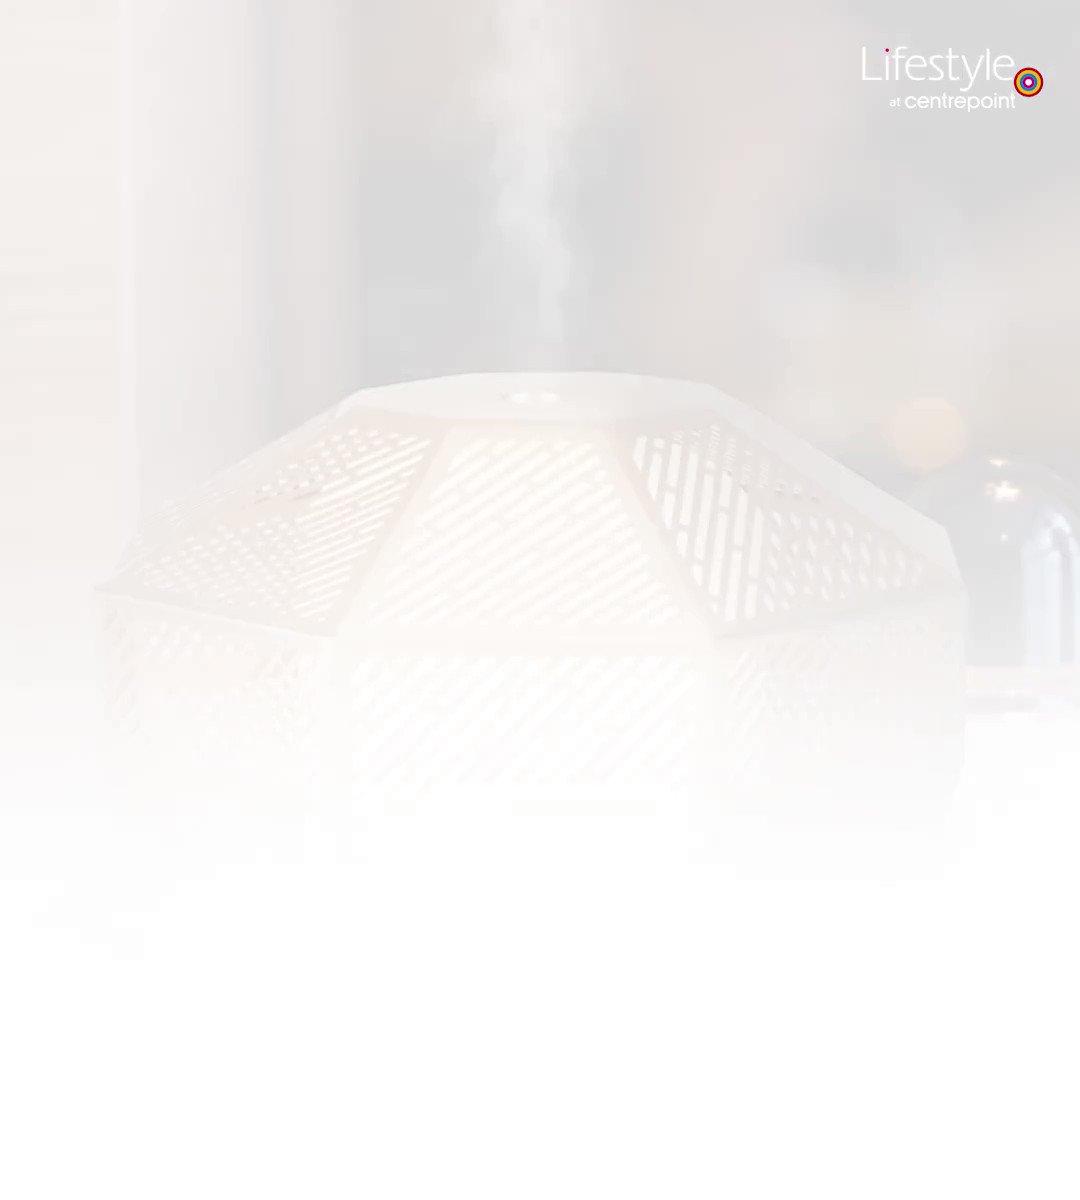 Create your Zen zone with our perfect blend of soothing oils & relax in the calming scents! Shop in-stores and online  اصنعي مساحة Zenلنفسك مع تشكيلتنا المثالية من الزيوت المهدئة واسترخي في جو يعبقبالروائح الهادئة! تسوقي في محلاتنا وأونلاين https://t.co/tBmNiJK8ri